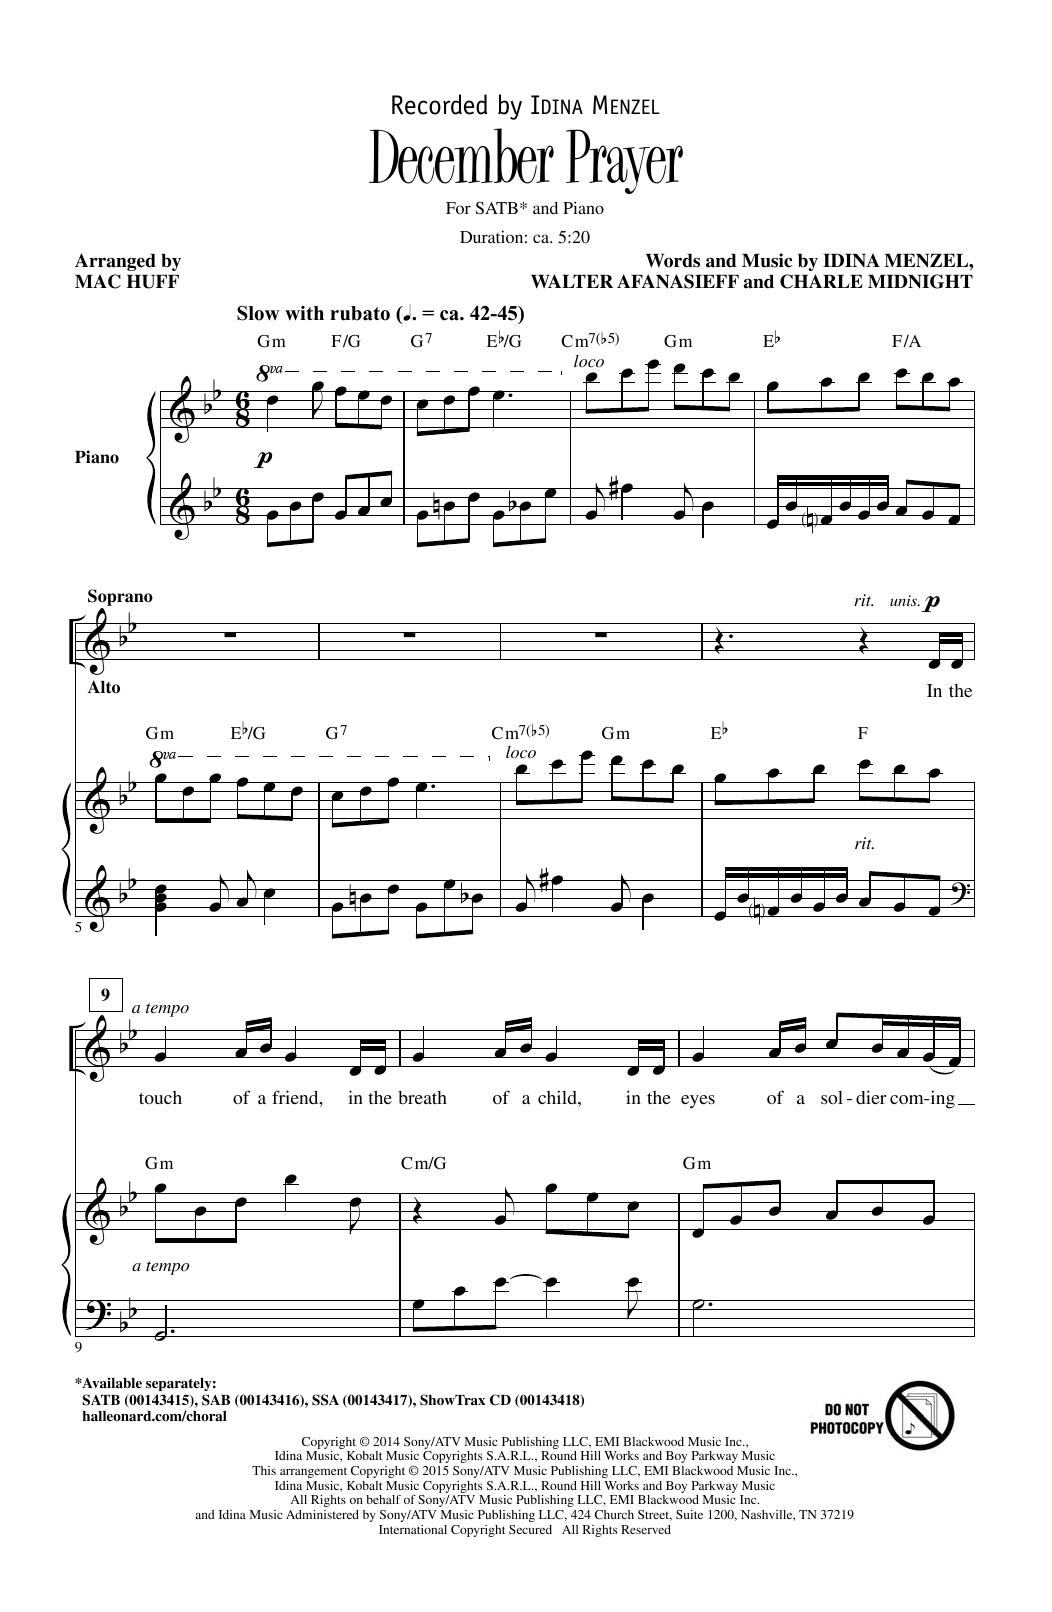 Sheet Music Digital Files To Print - Licensed Idina Menzel Digital ...